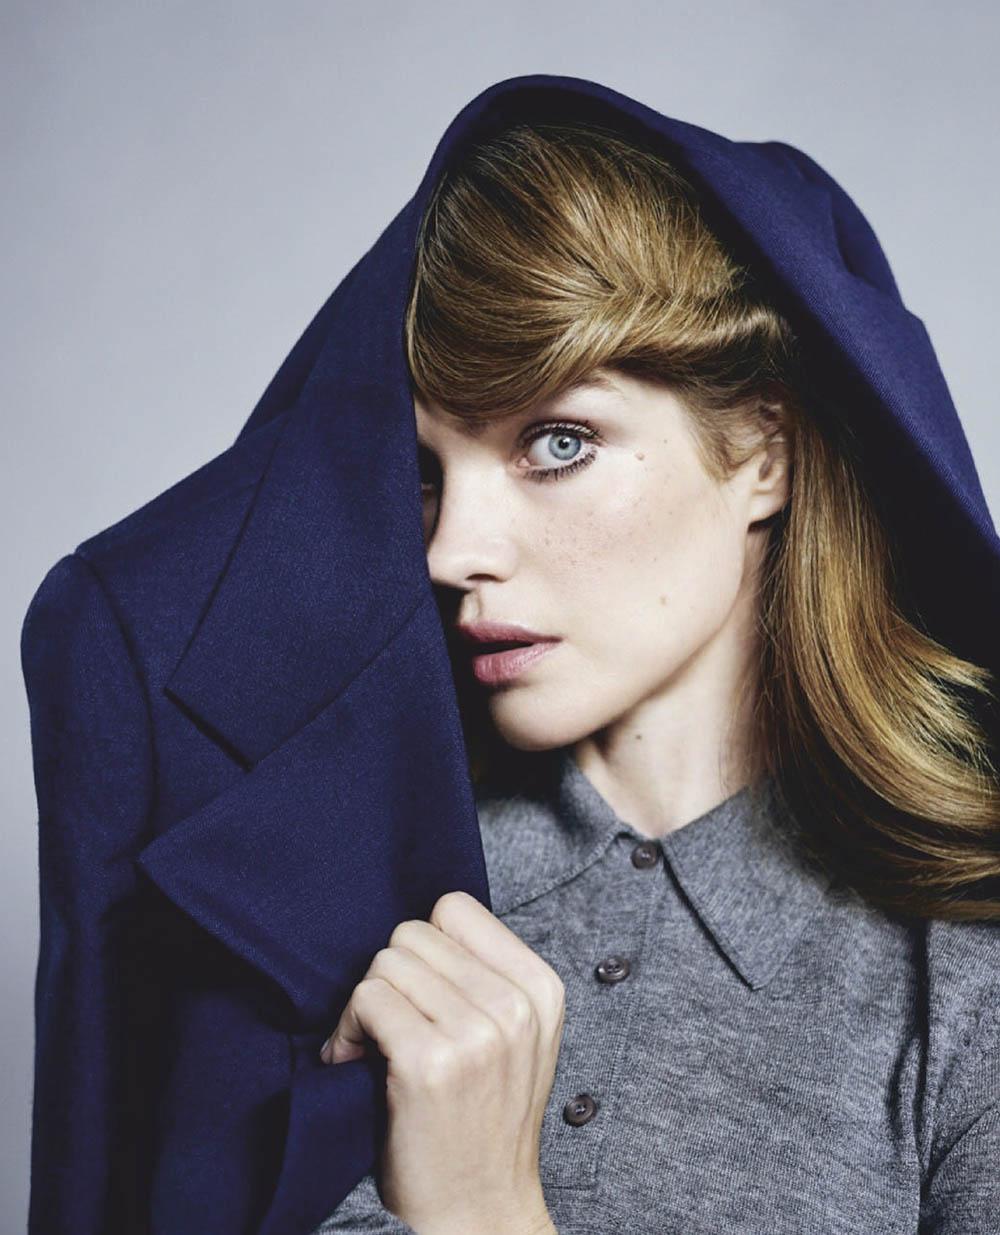 Natalia Vodianova covers Elle Russia February 2020 by Mathieu CesarNatalia Vodianova covers Elle Russia February 2020 by Mathieu Cesar